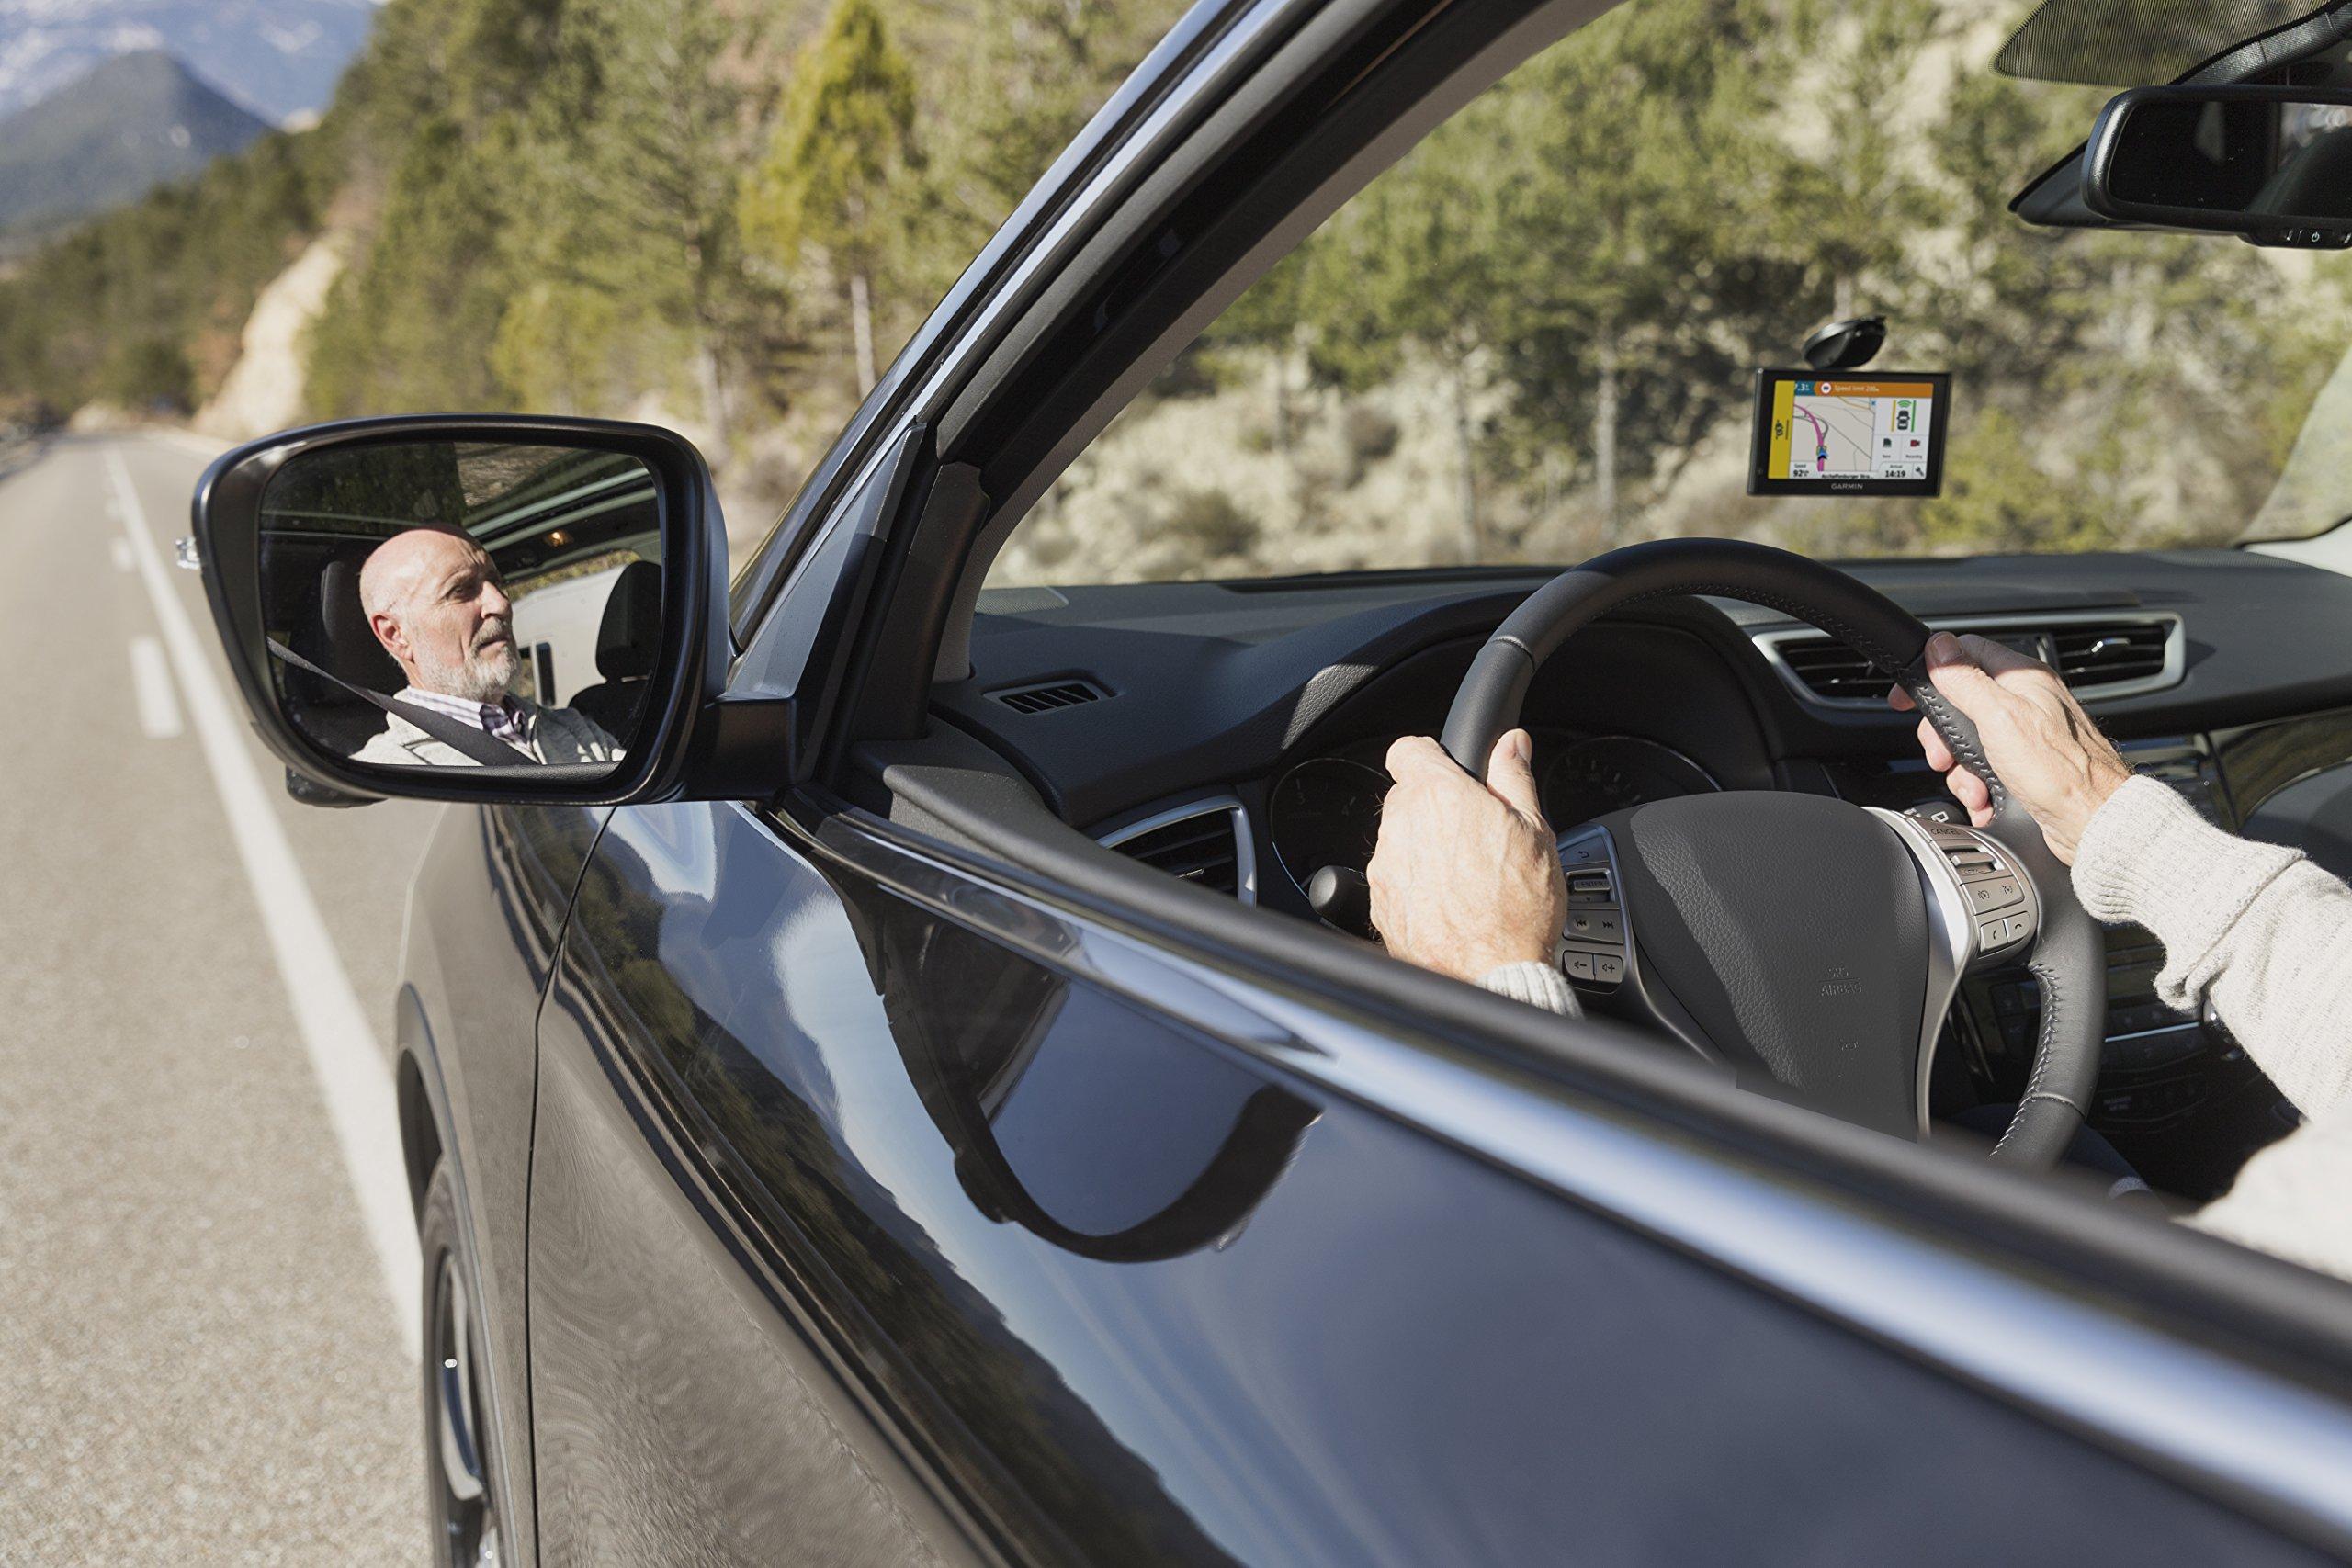 Garmin-DriveAssist-50-LMT-Navigationsgert-127cm-5-Zoll-Touch-Glasdisplay-lebenslange-Kartenupdates-Verkehrsfunklizenz-Dash-Cam